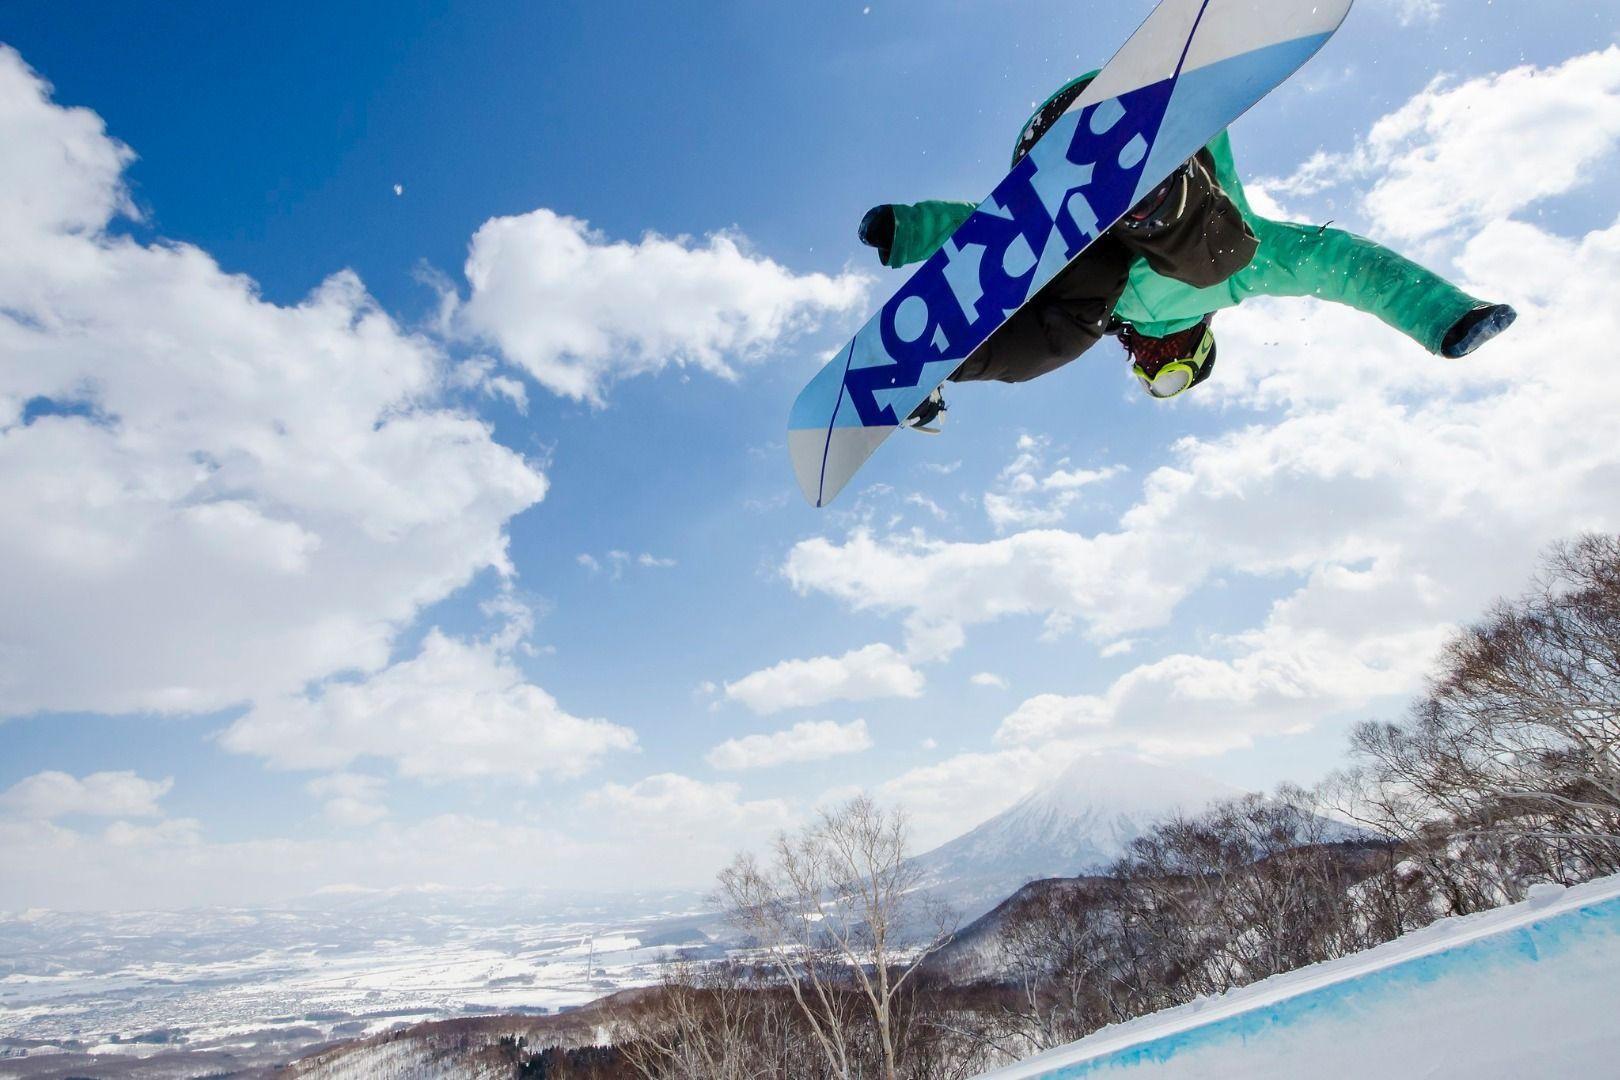 The Hotspot for Powder Snow - Niseko Hokkaido